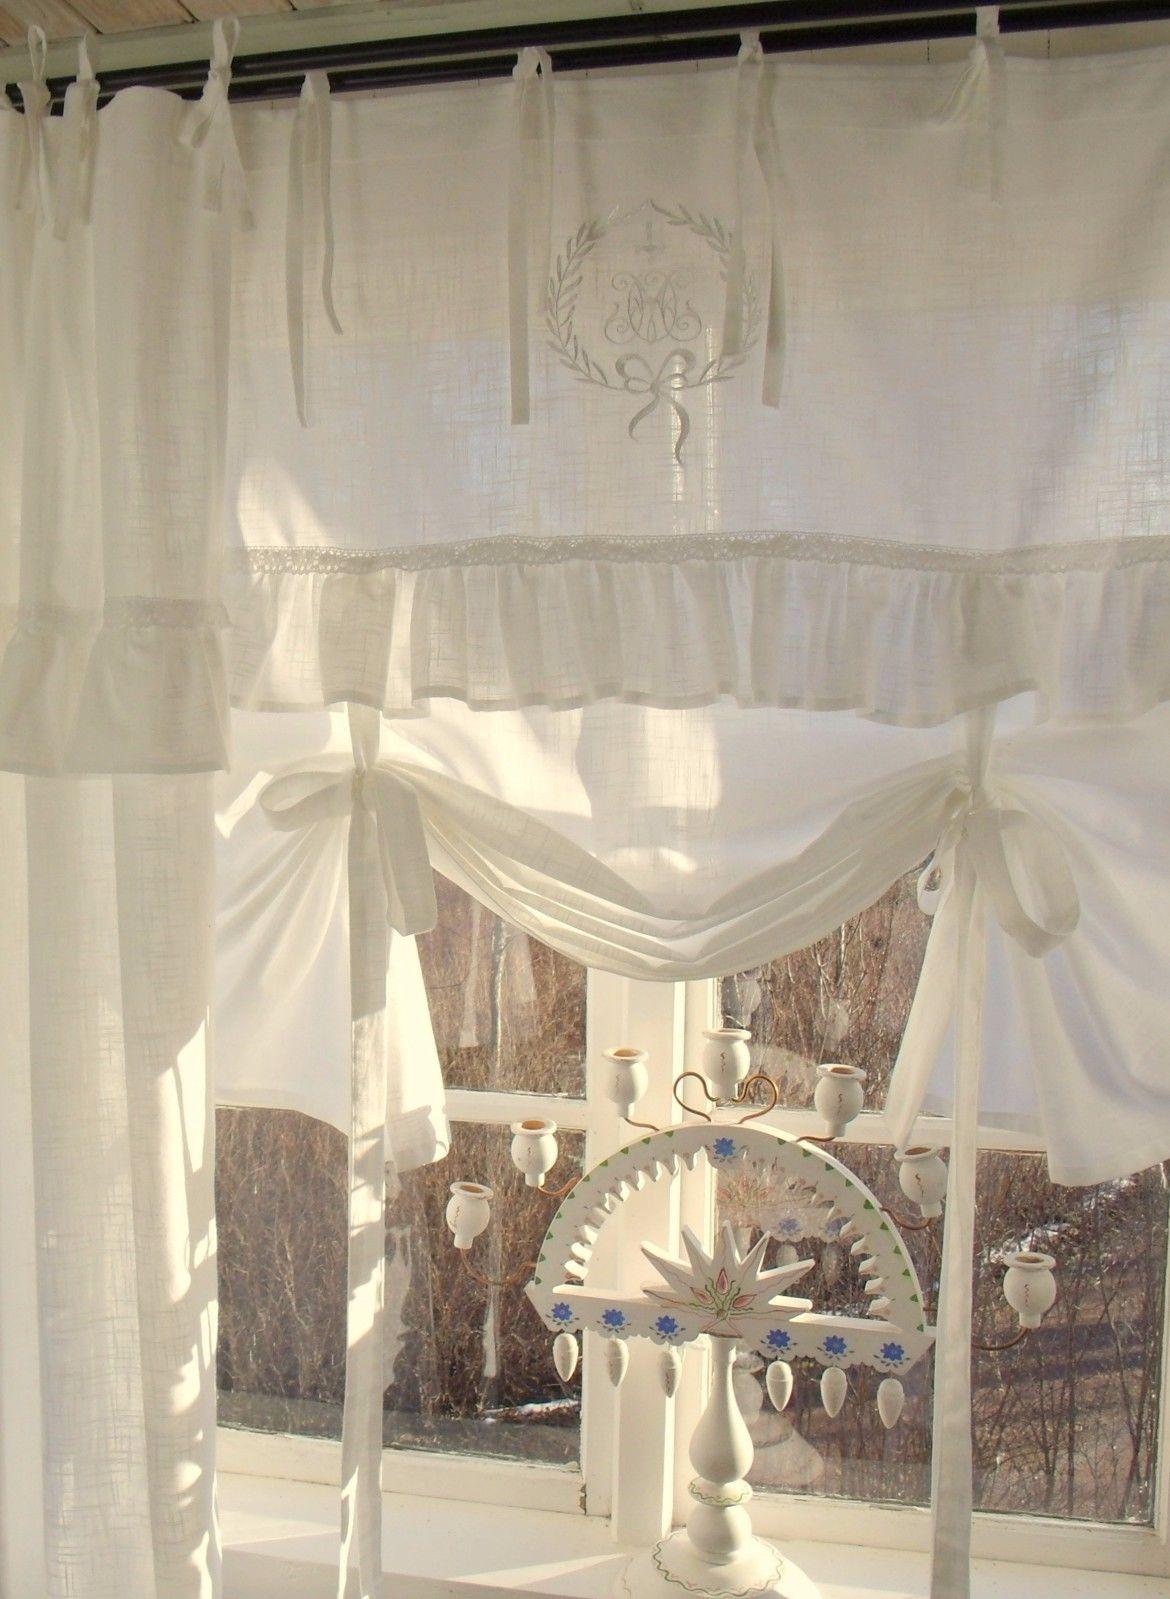 Raff gardine lara offwhite 160x120 cm volant bestickt raffgardinen rollos gardinen - Raffgardinen landhausstil ...